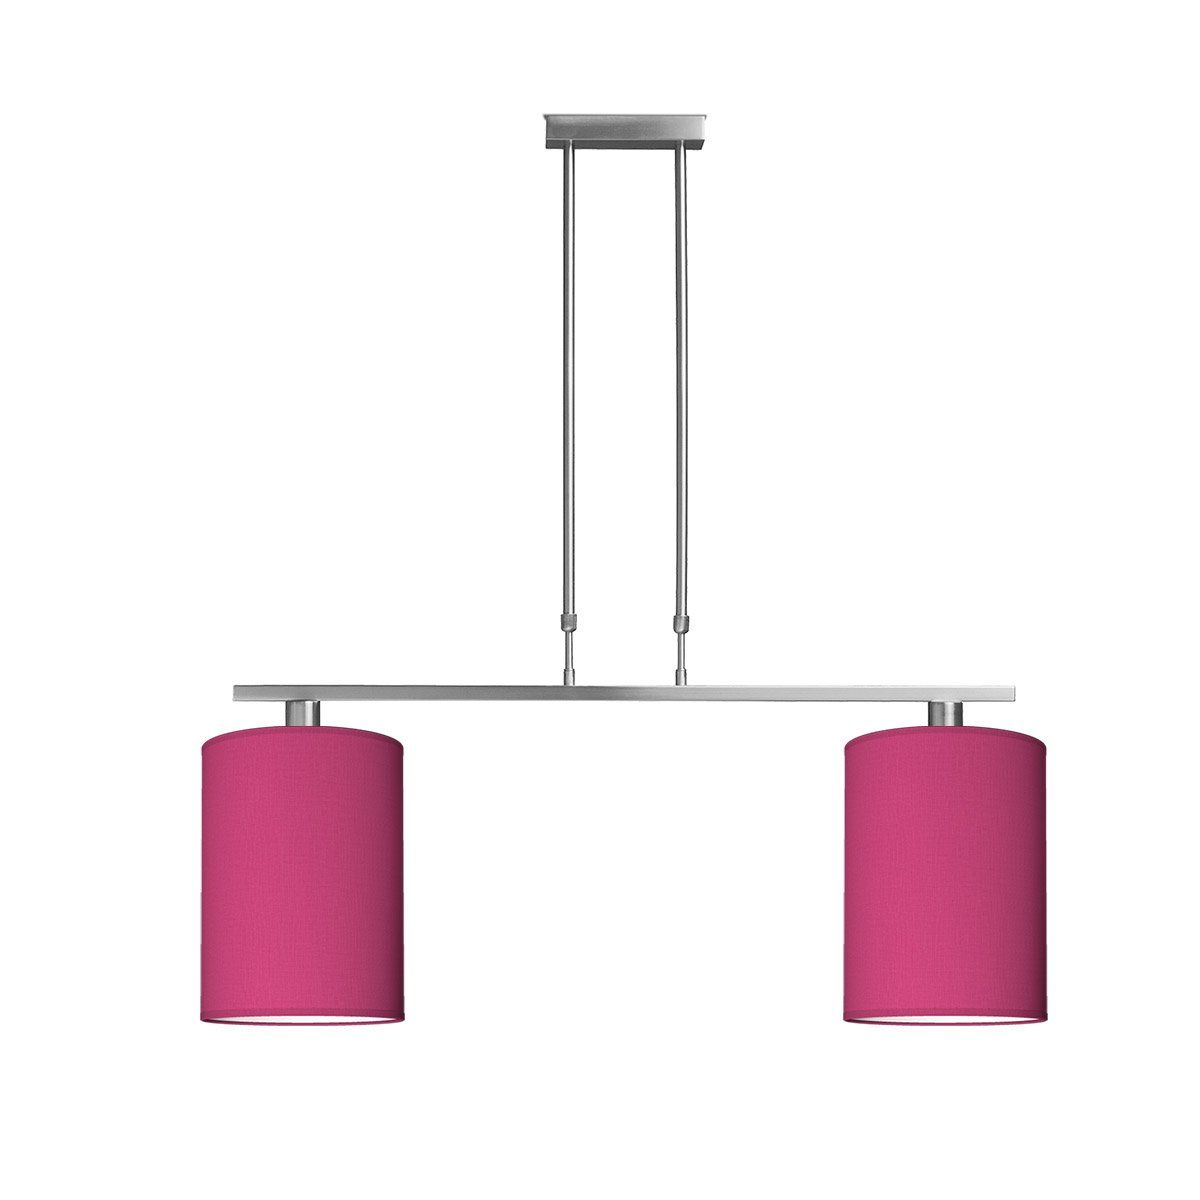 hanglamp bridge 2 tube Ø 25 cm - roze